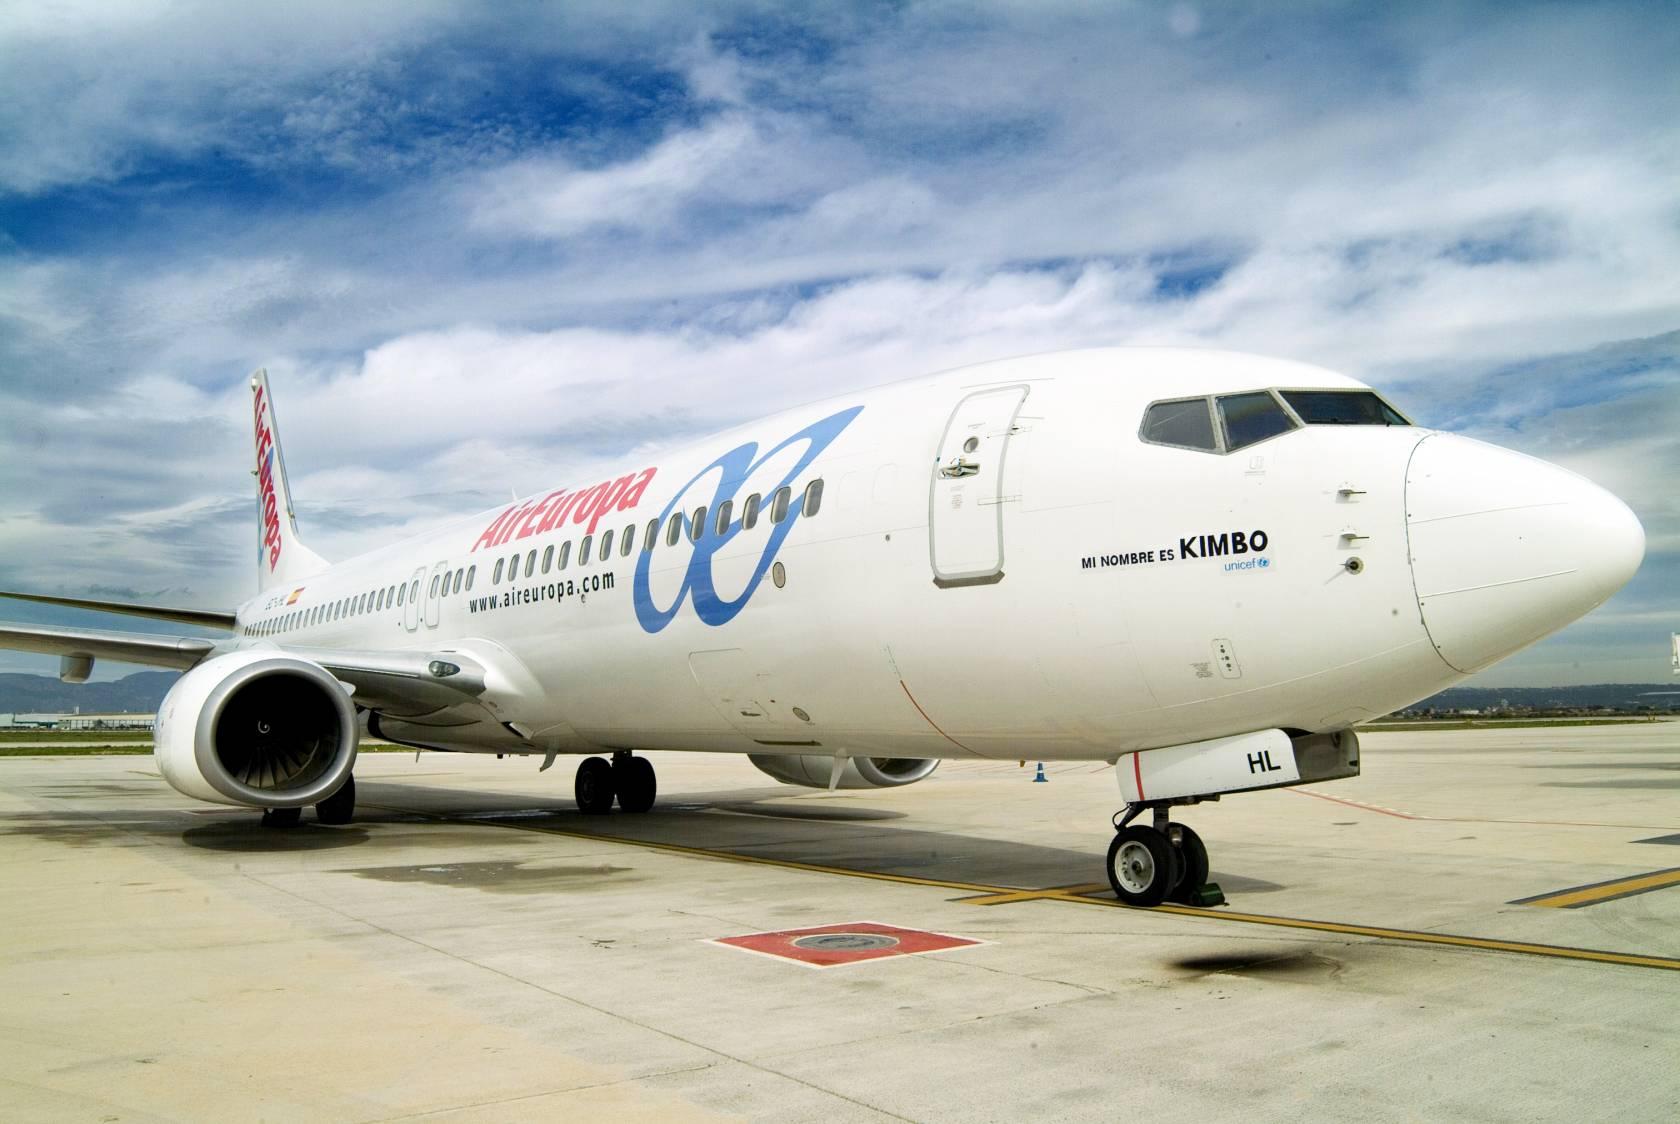 Air Europa Unicef Kimbo